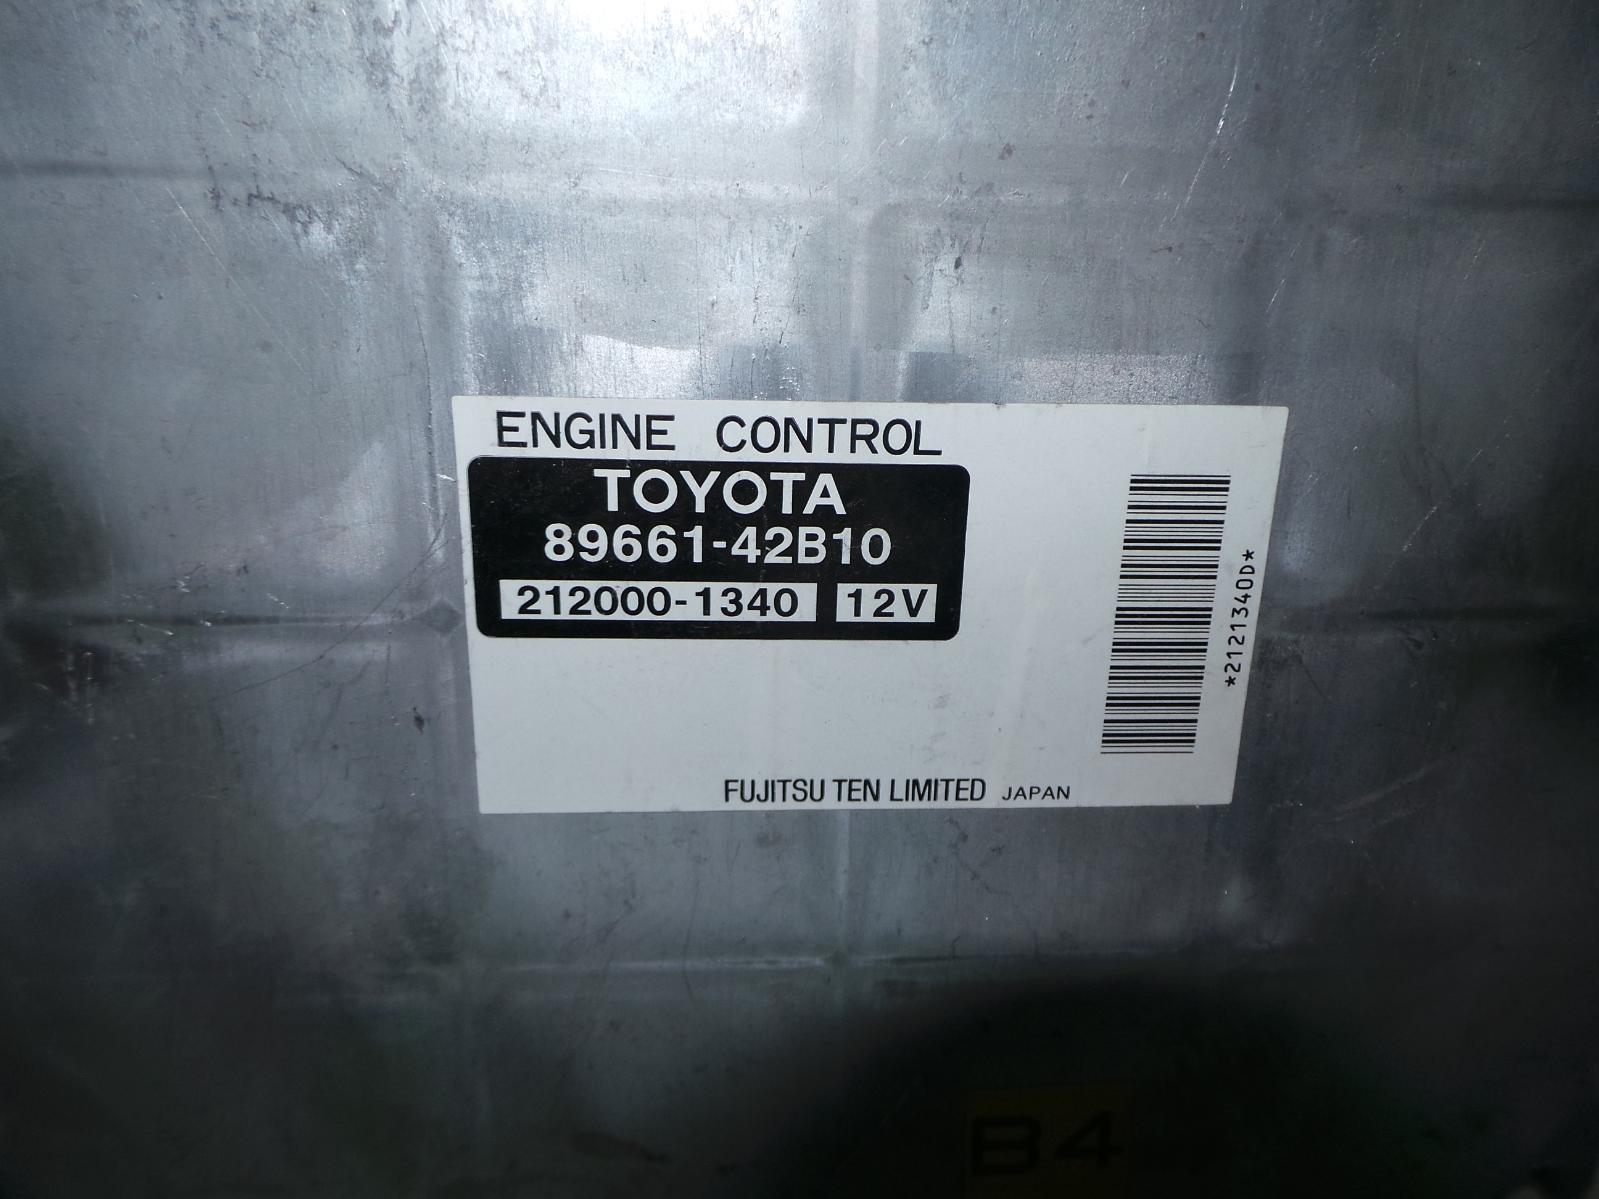 TOYOTA RAV4, Ecu, ENGINE ECU, 2.4, MANUAL T/M TYPE, 89661-42B10, ECU ONLY, ACA2#R, 07/03-10/05